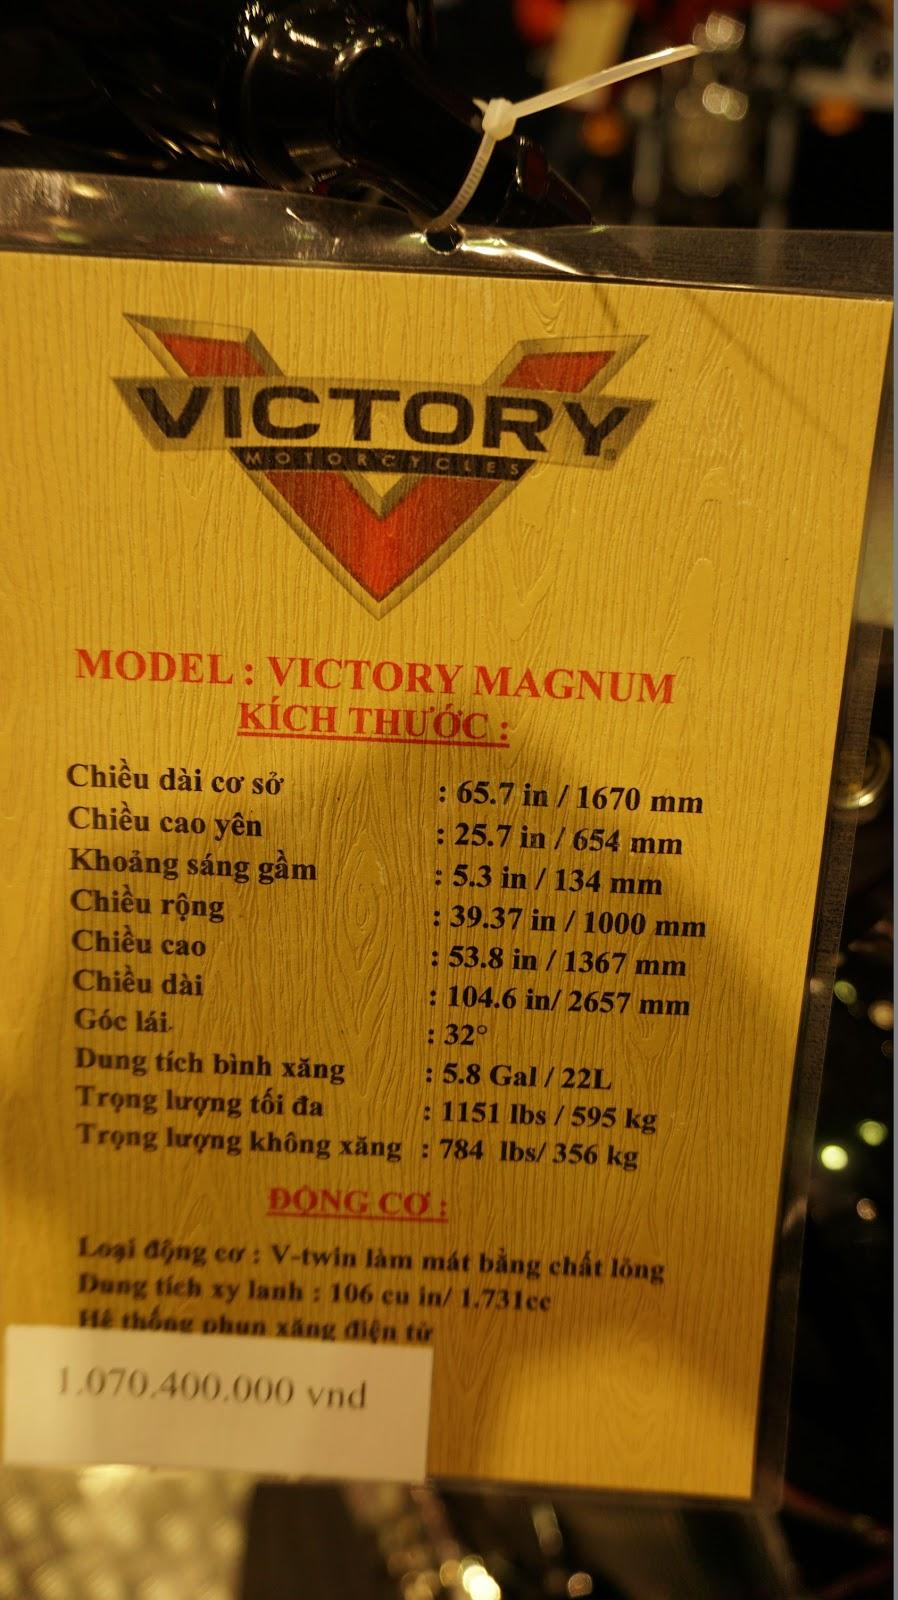 Victory Magnum